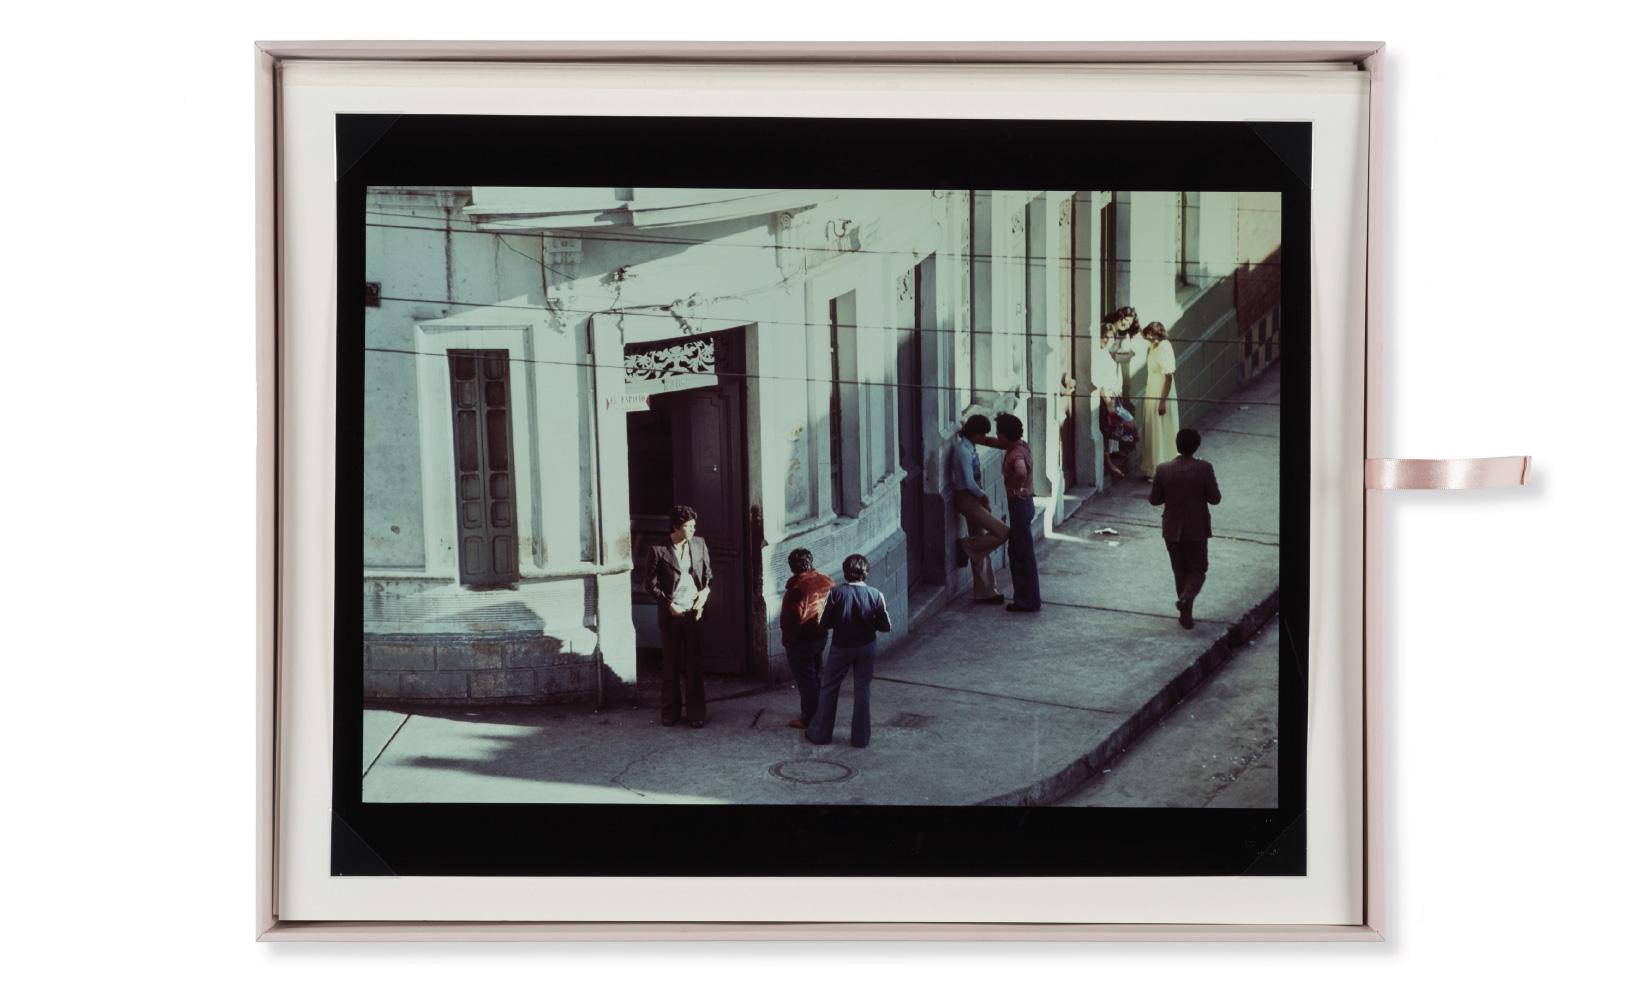 esquina-rose-rojas-toluca-studio-olivier-andreotti-06.jpg